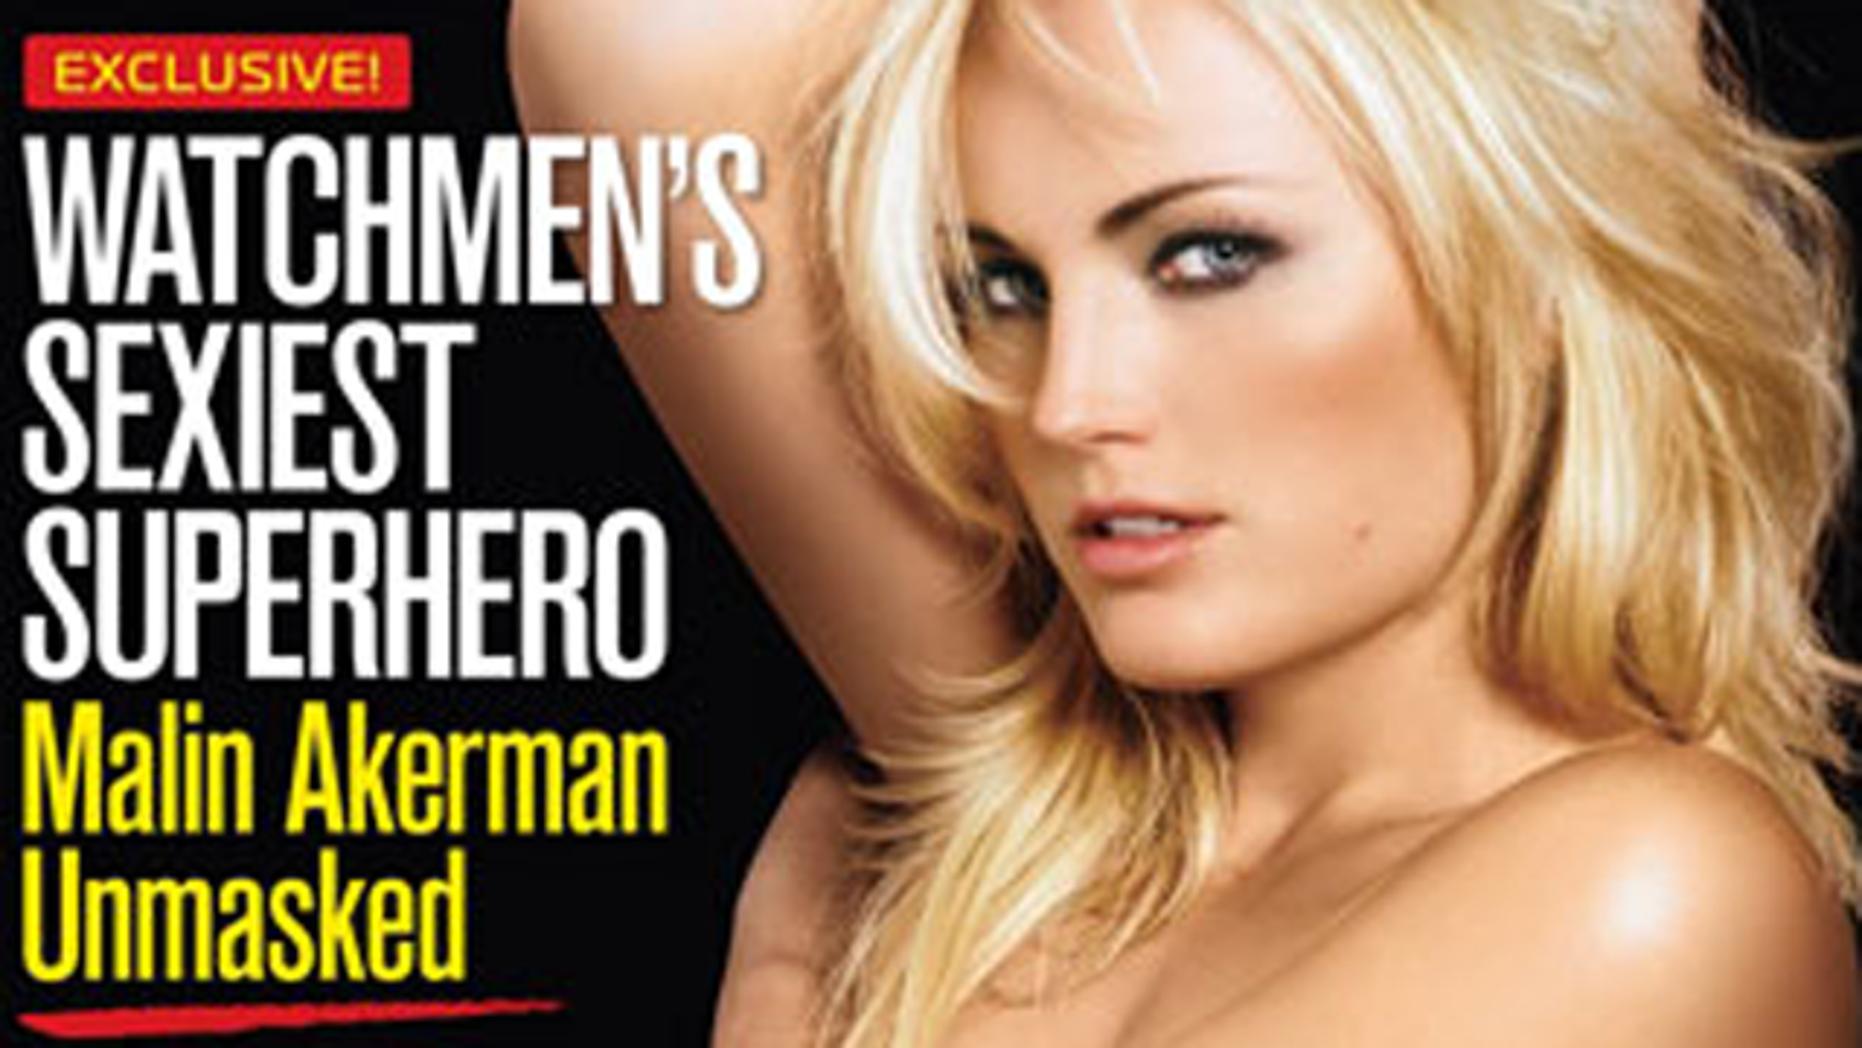 Malin Ackerman in Maxim. (Maxim)